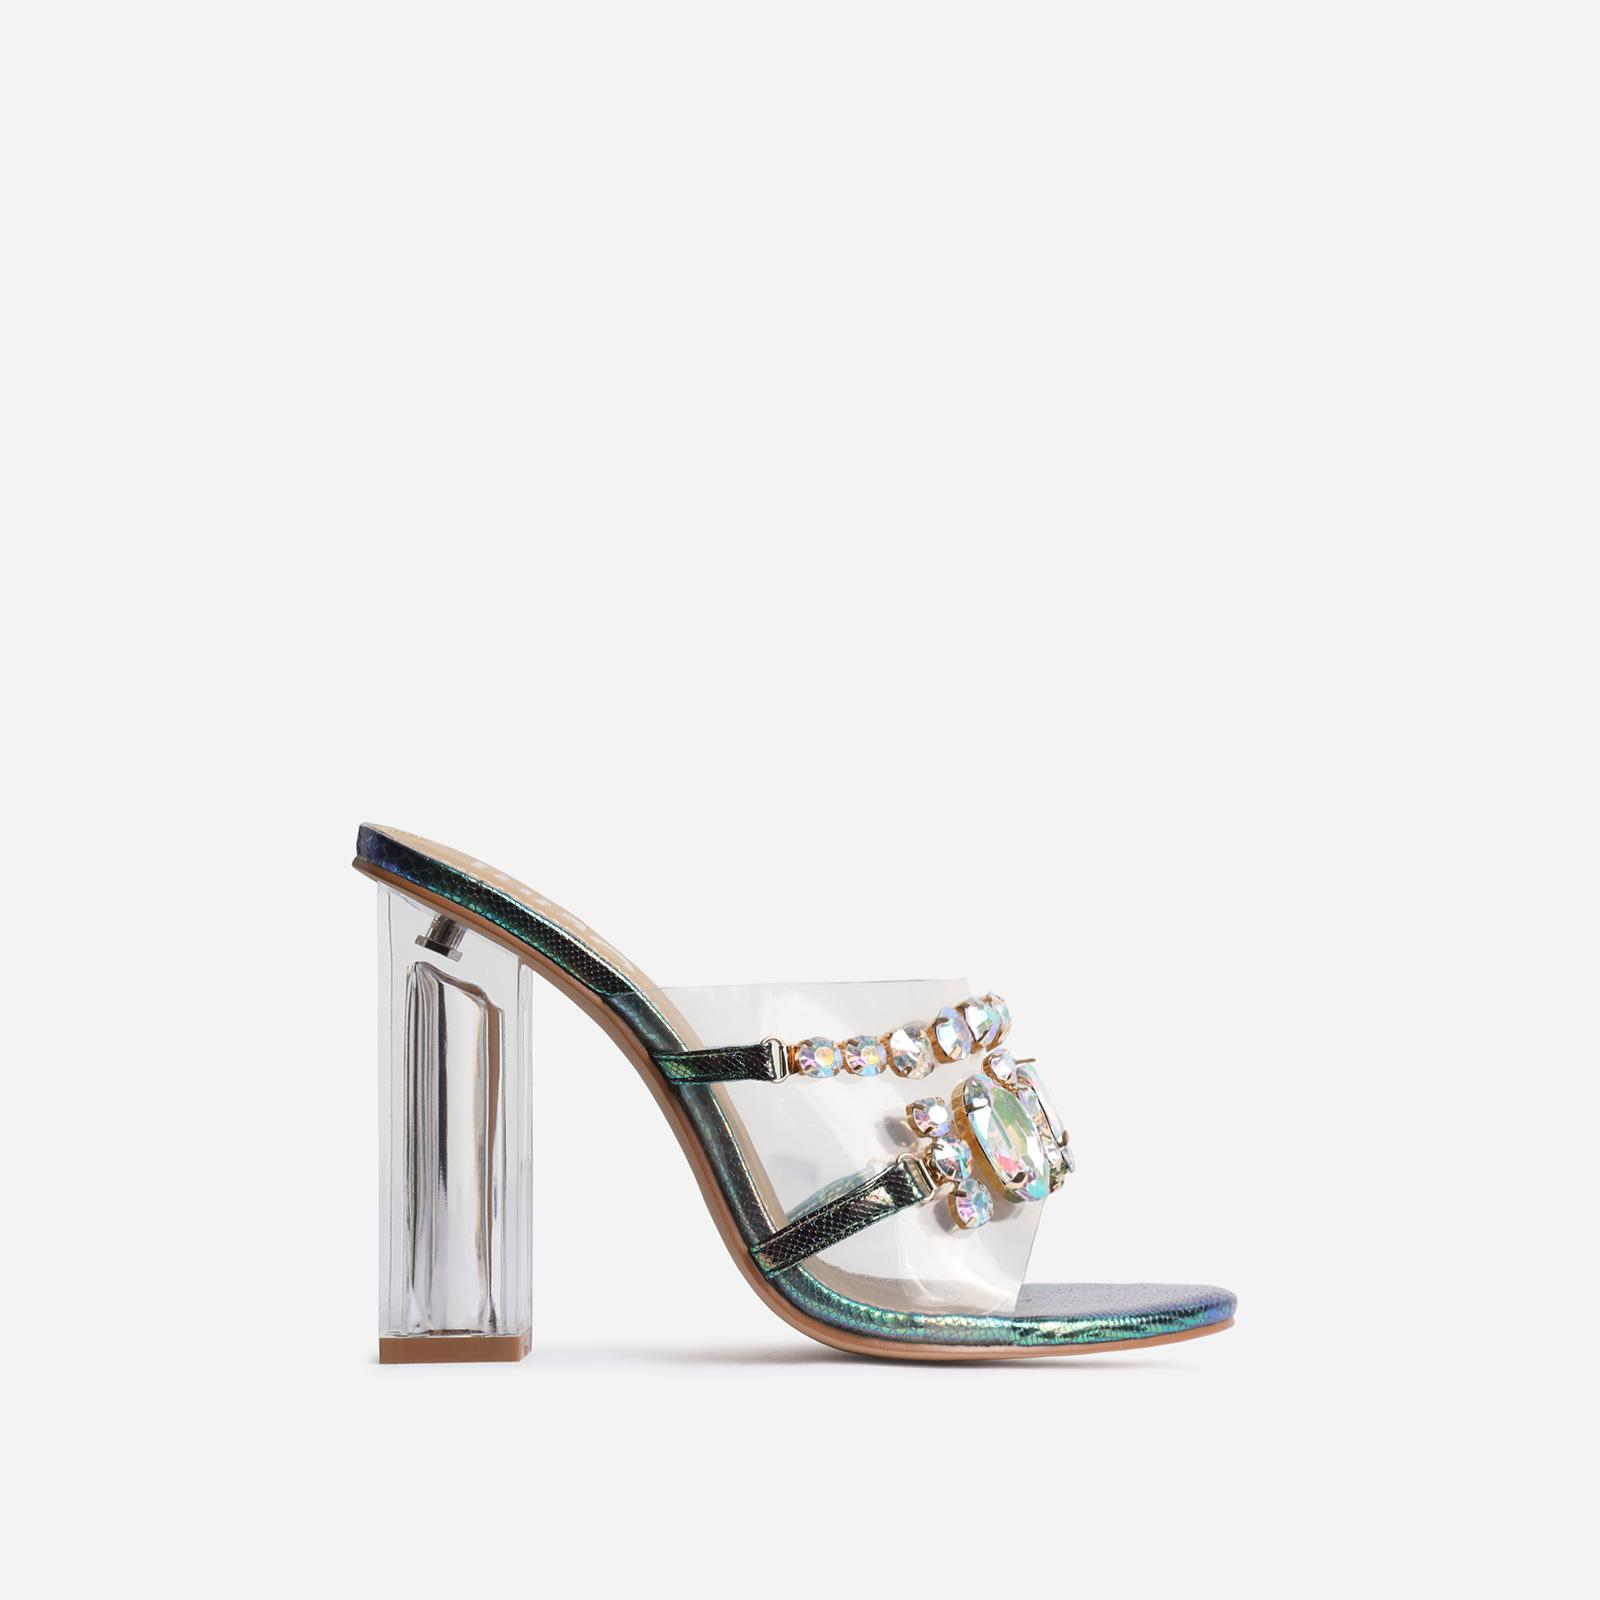 Frost Gem Embellished Clear Perspex Peep Toe Block Heel Mule In Green Snake Print Faux Leather